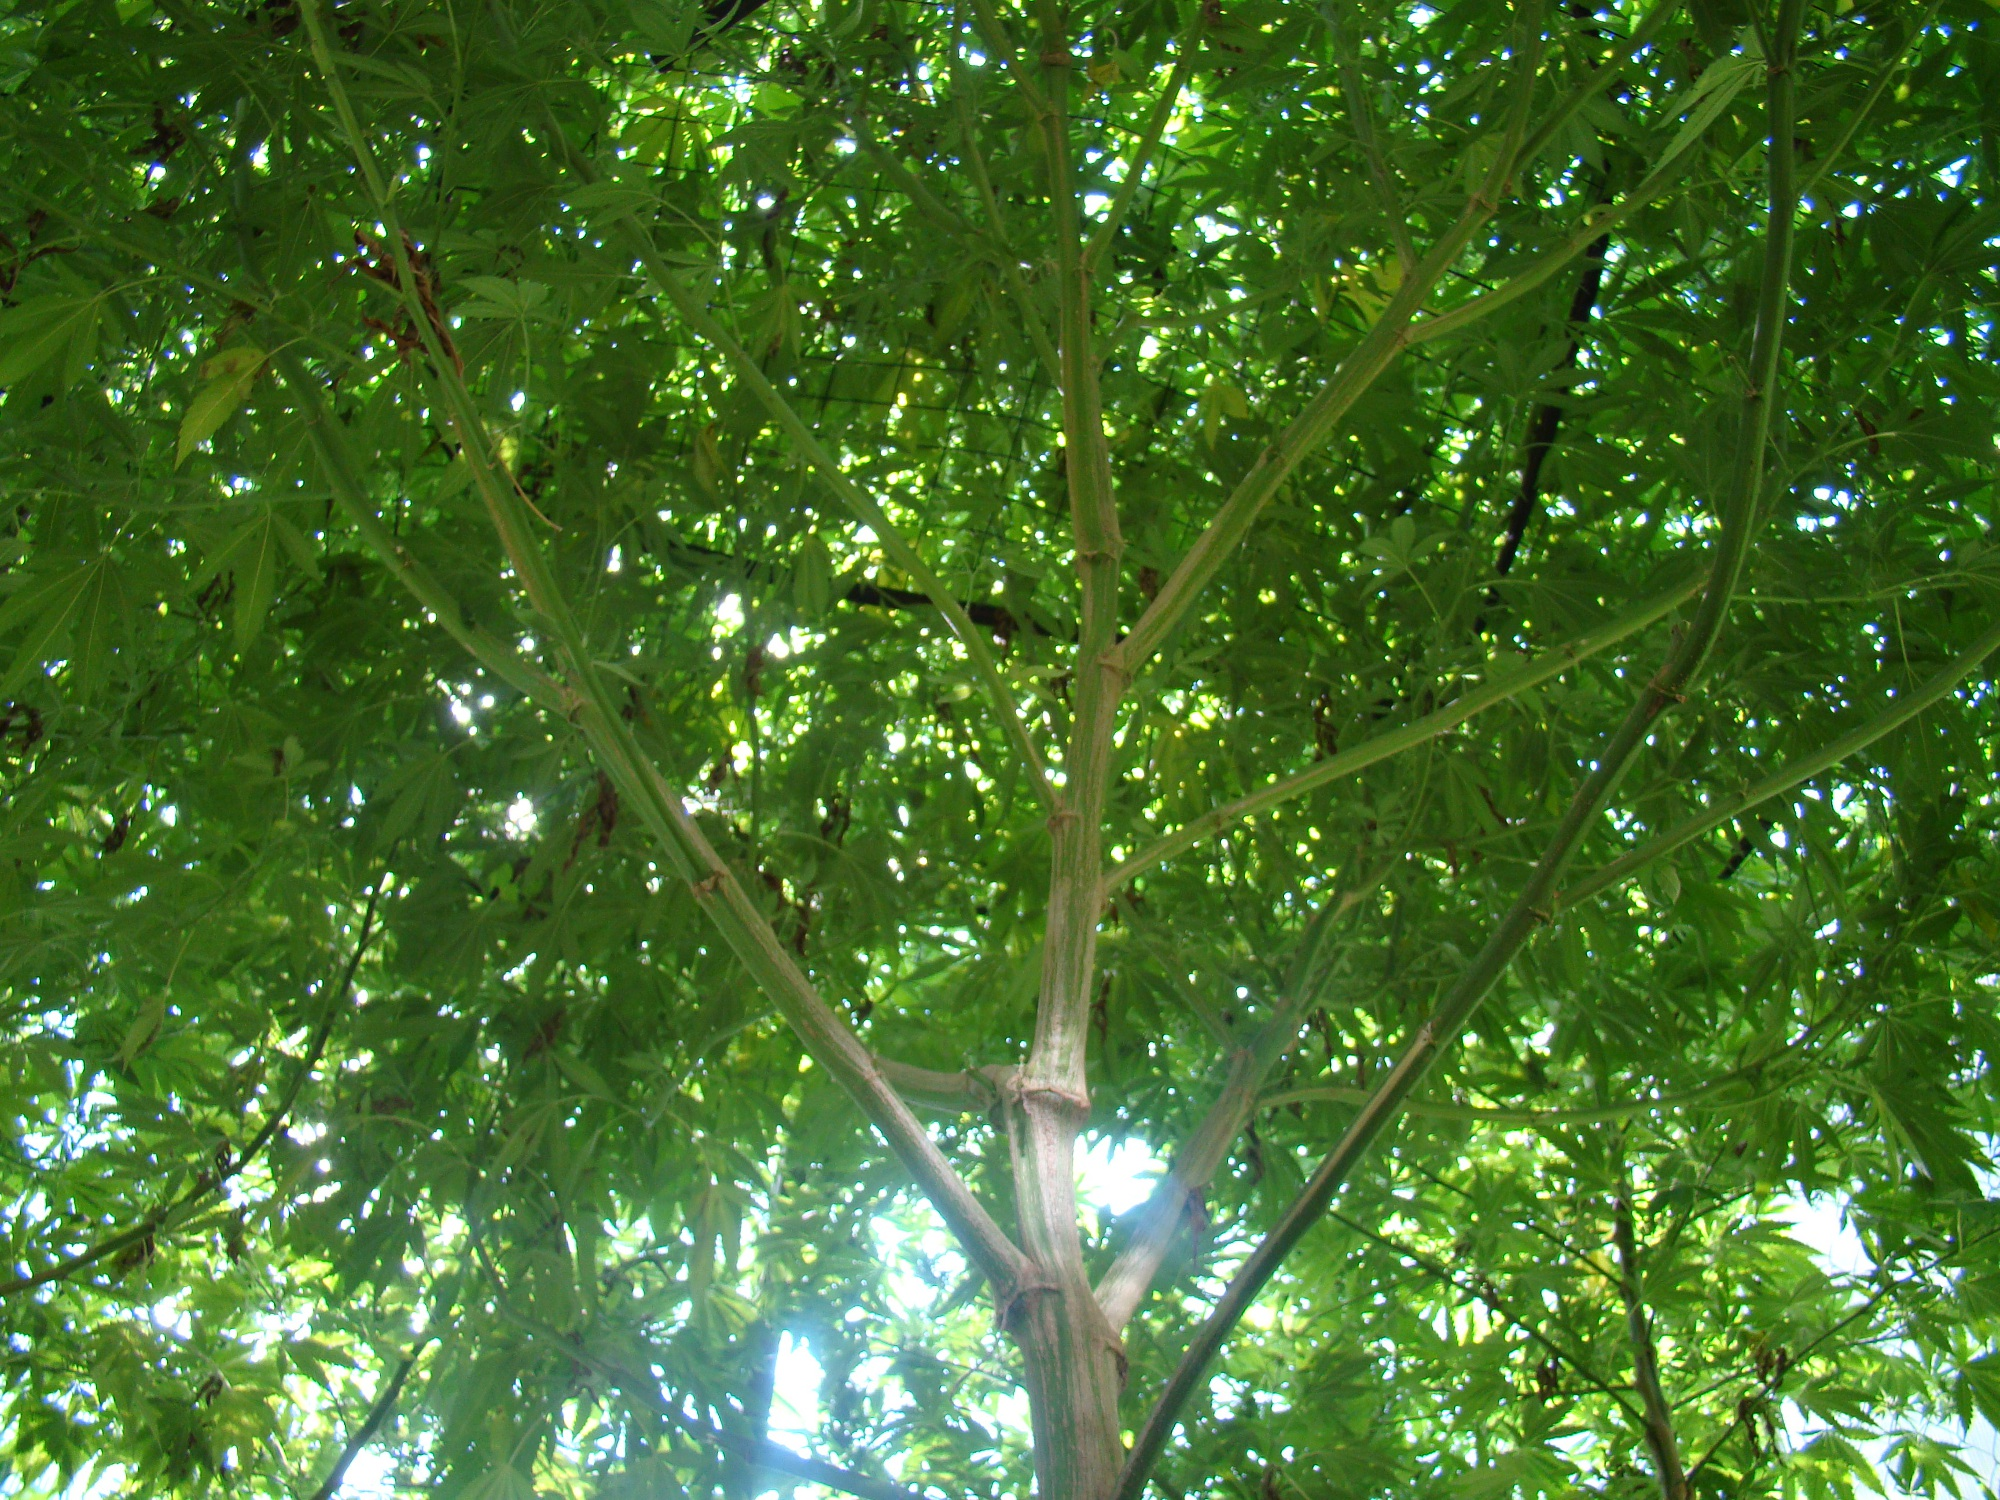 how to grow og kush outdoors